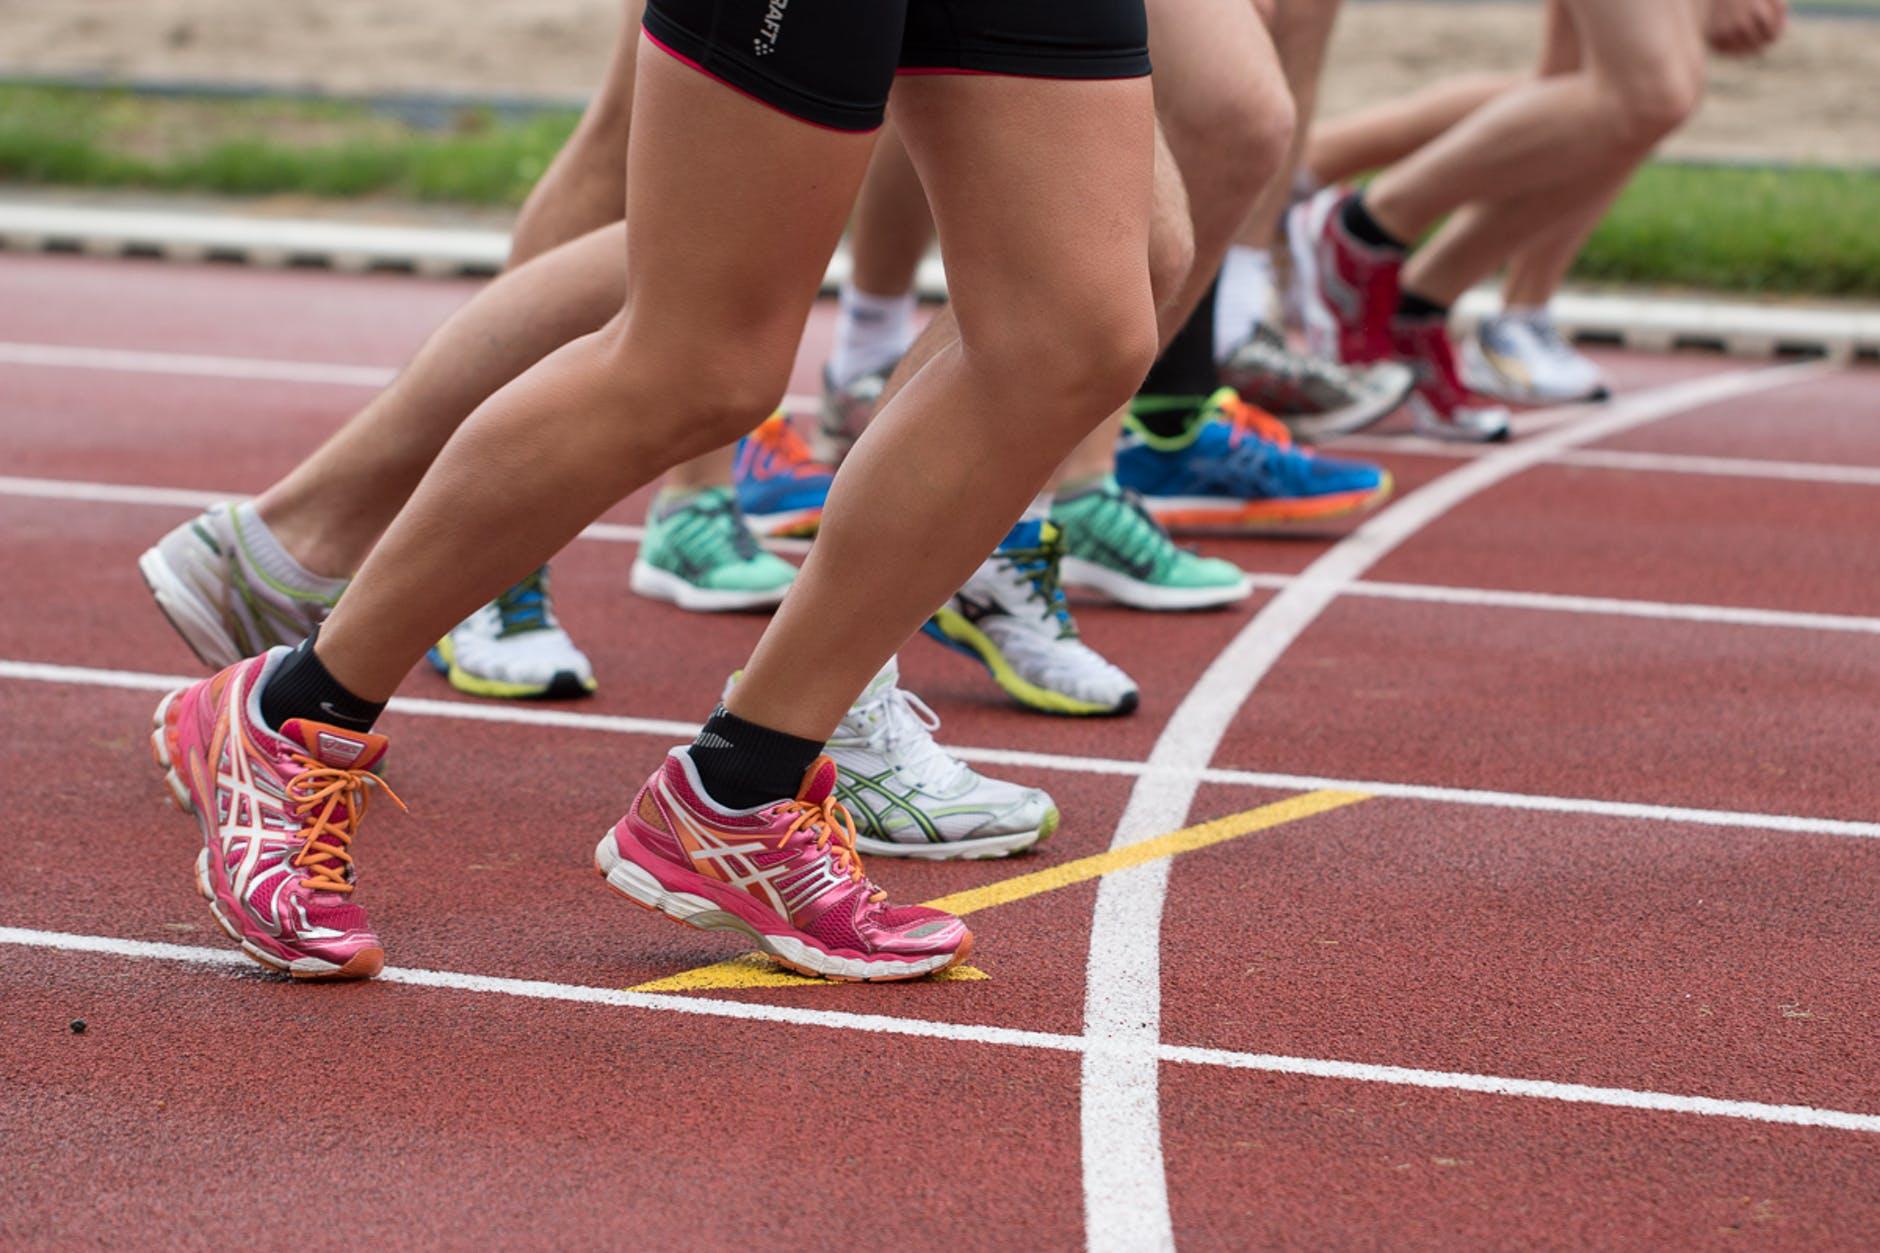 marathon running, race, @godlywoman911